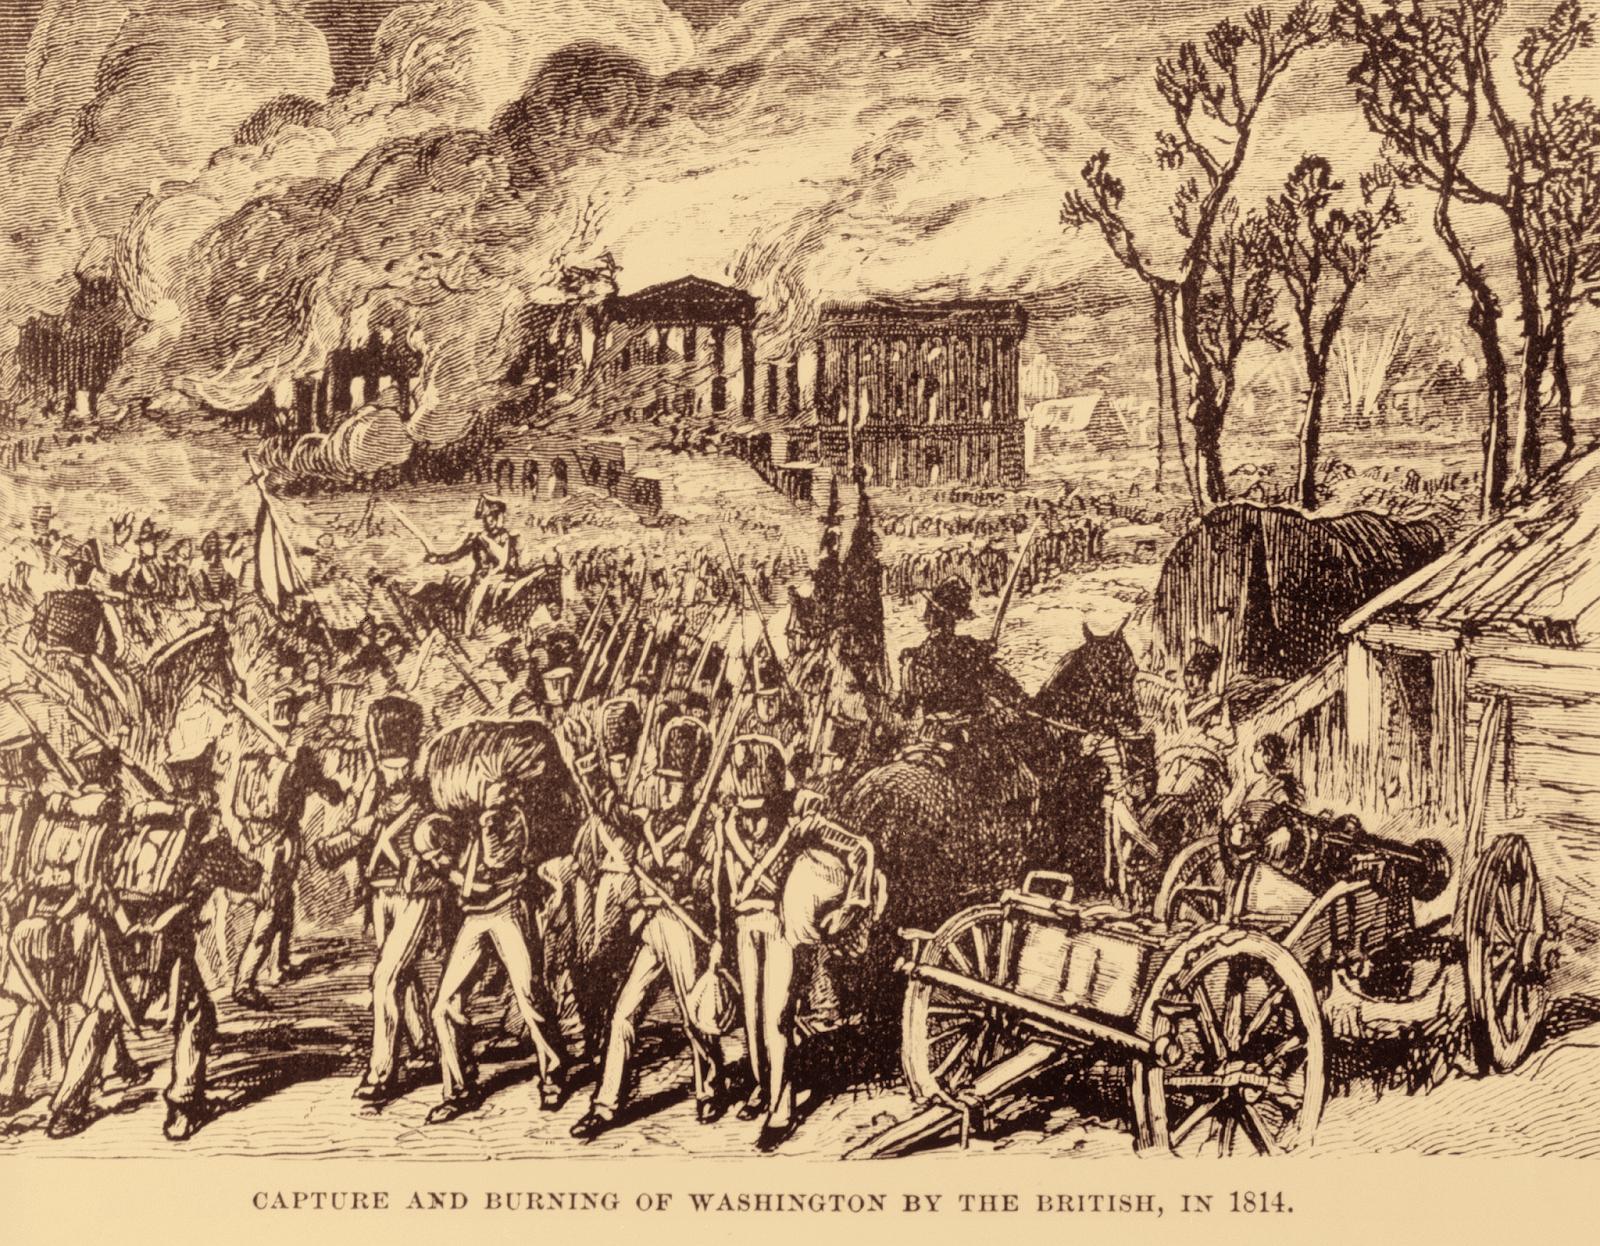 The Disastrous Burning of Washington in 1814